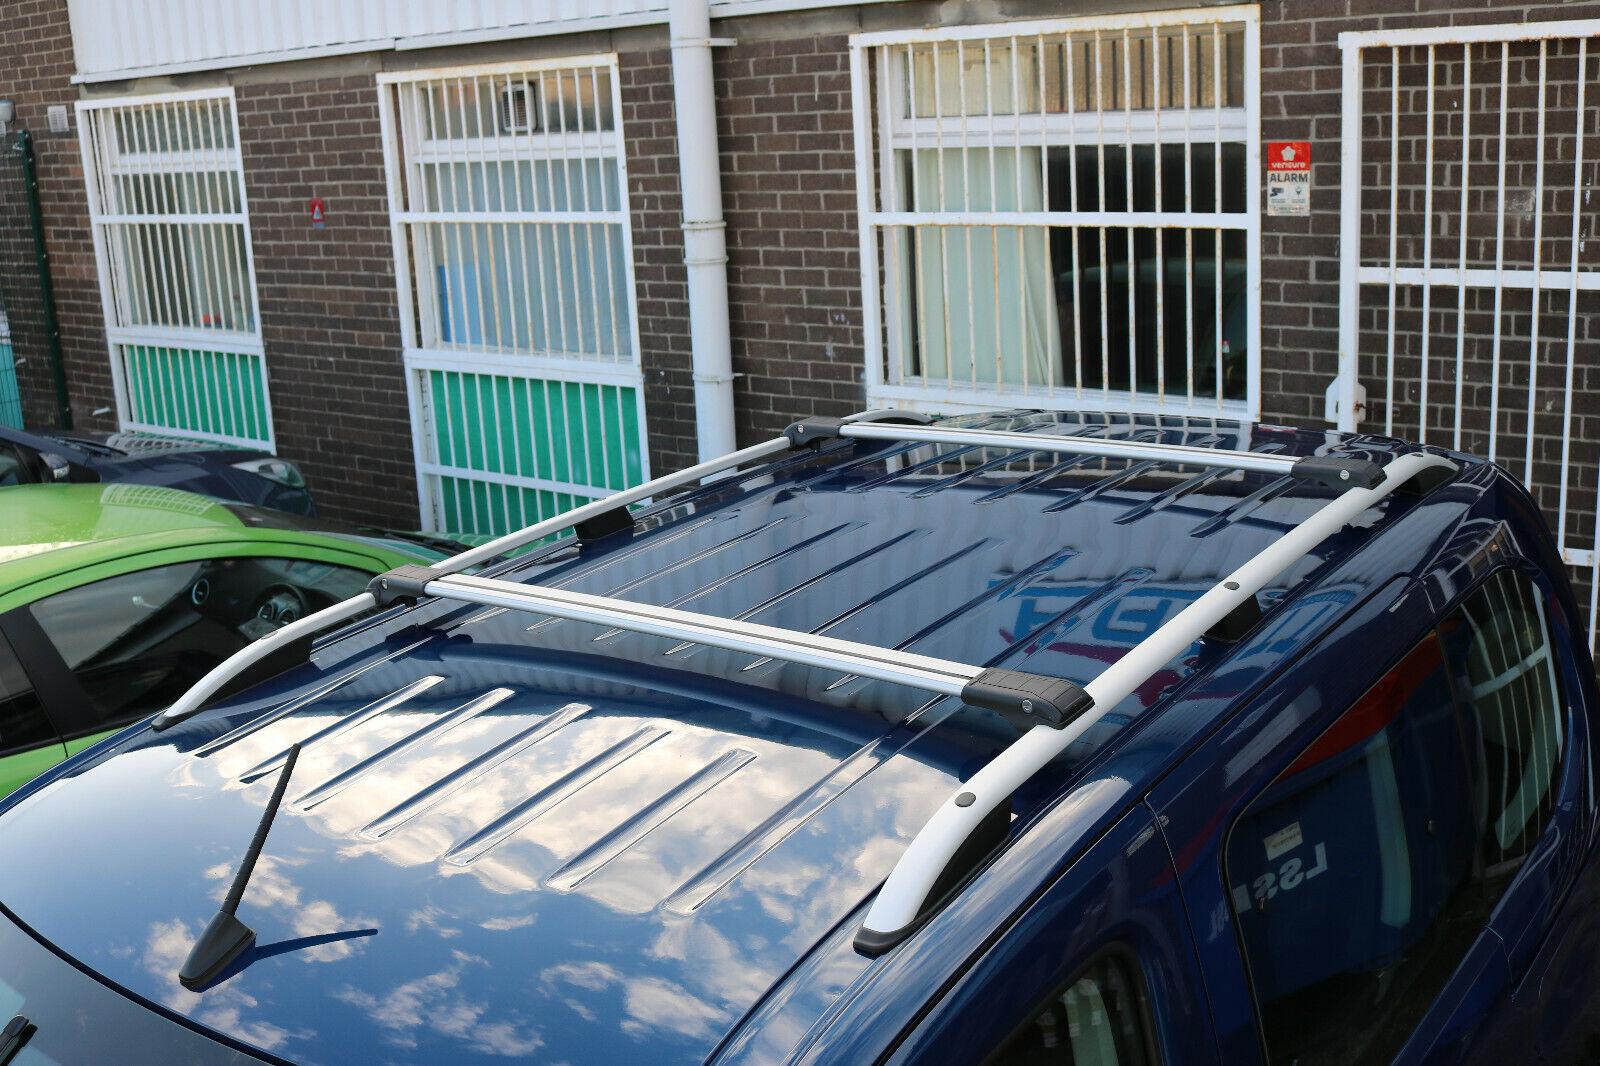 L3 2012 On-3x Roof Bars Vecta Bars by Hubb Mercedes Citan Roof Rack,